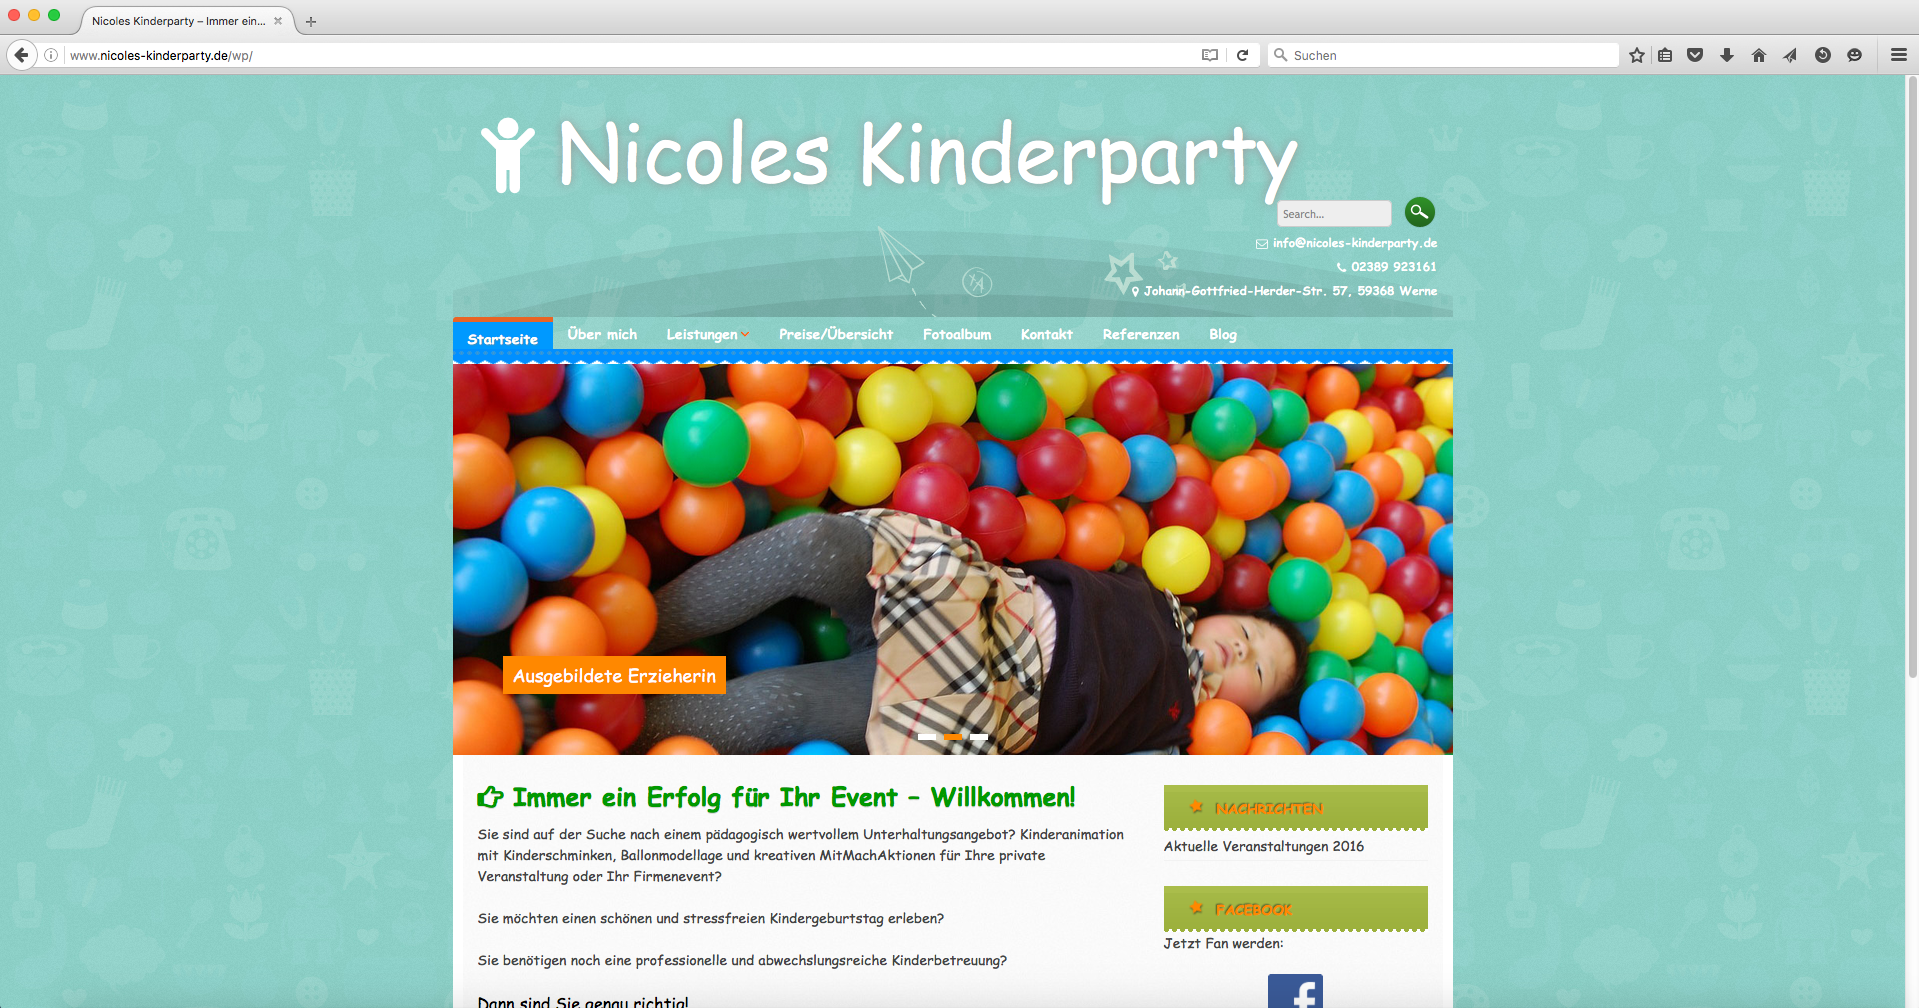 www.nicoles-kinderparty.de